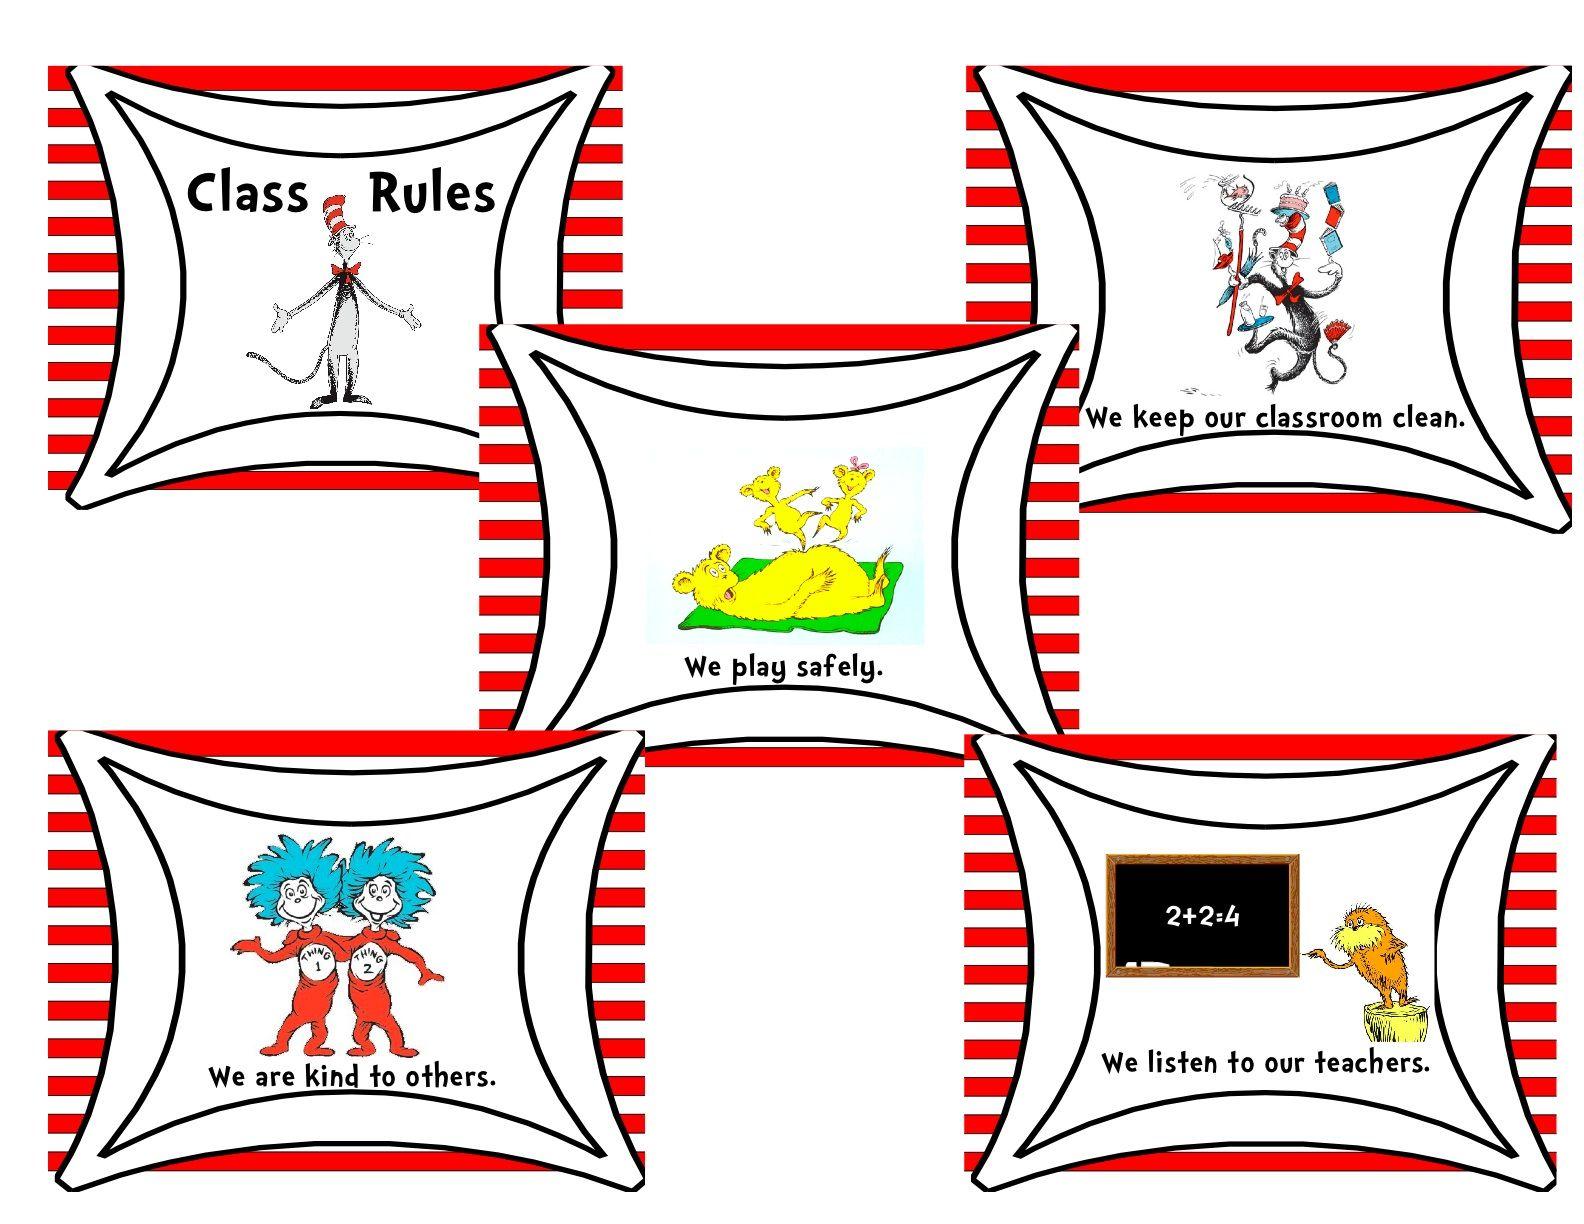 I Created A Classroom Rules Dr Seuss Theme